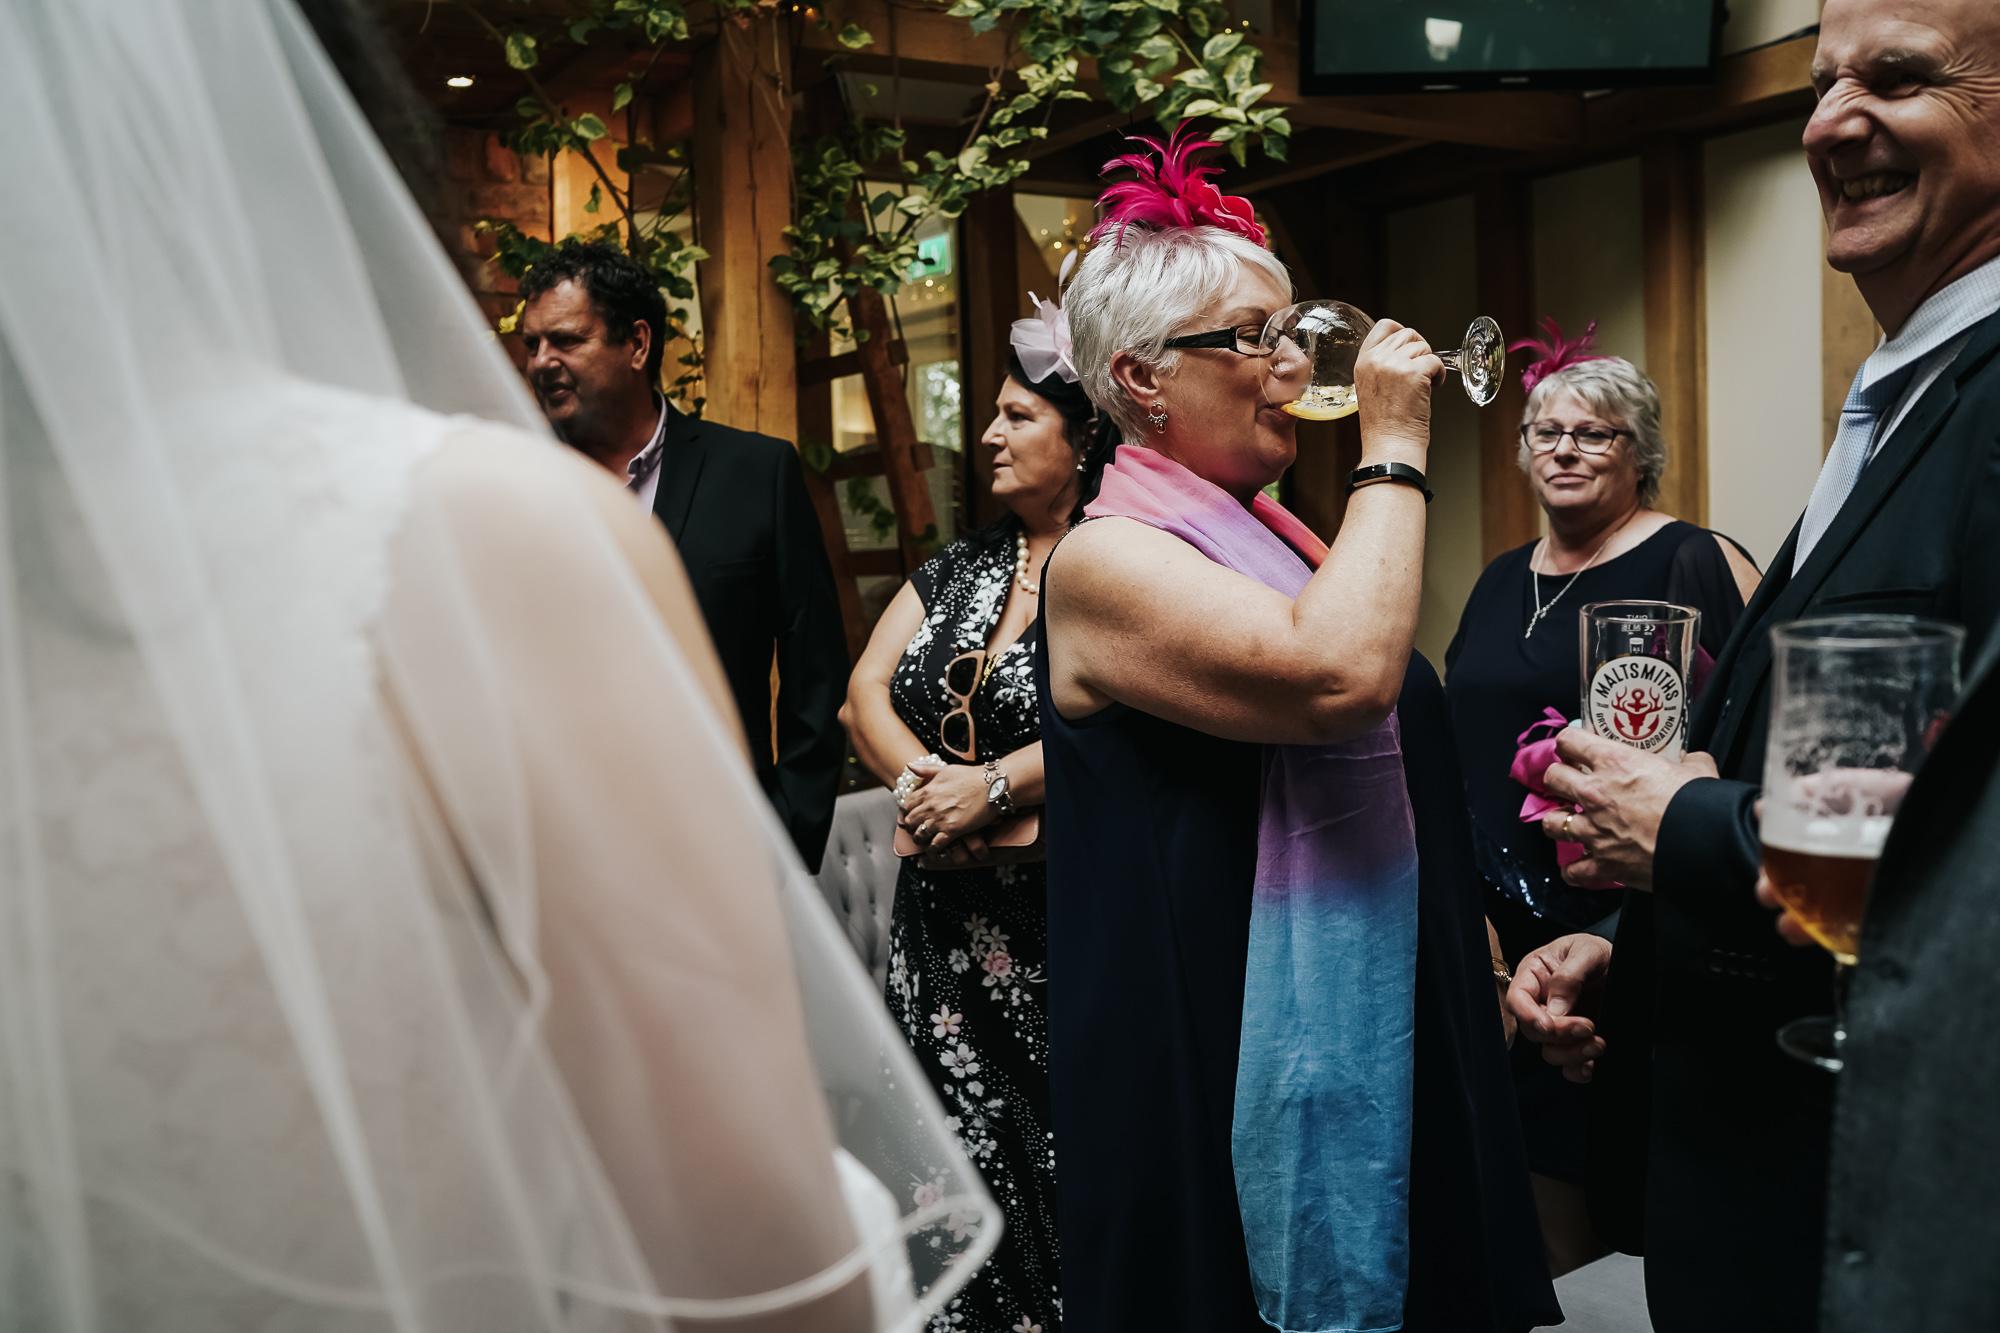 Oak tree of peover wedding photography cheshire wedding photographer (41 of 56).jpg